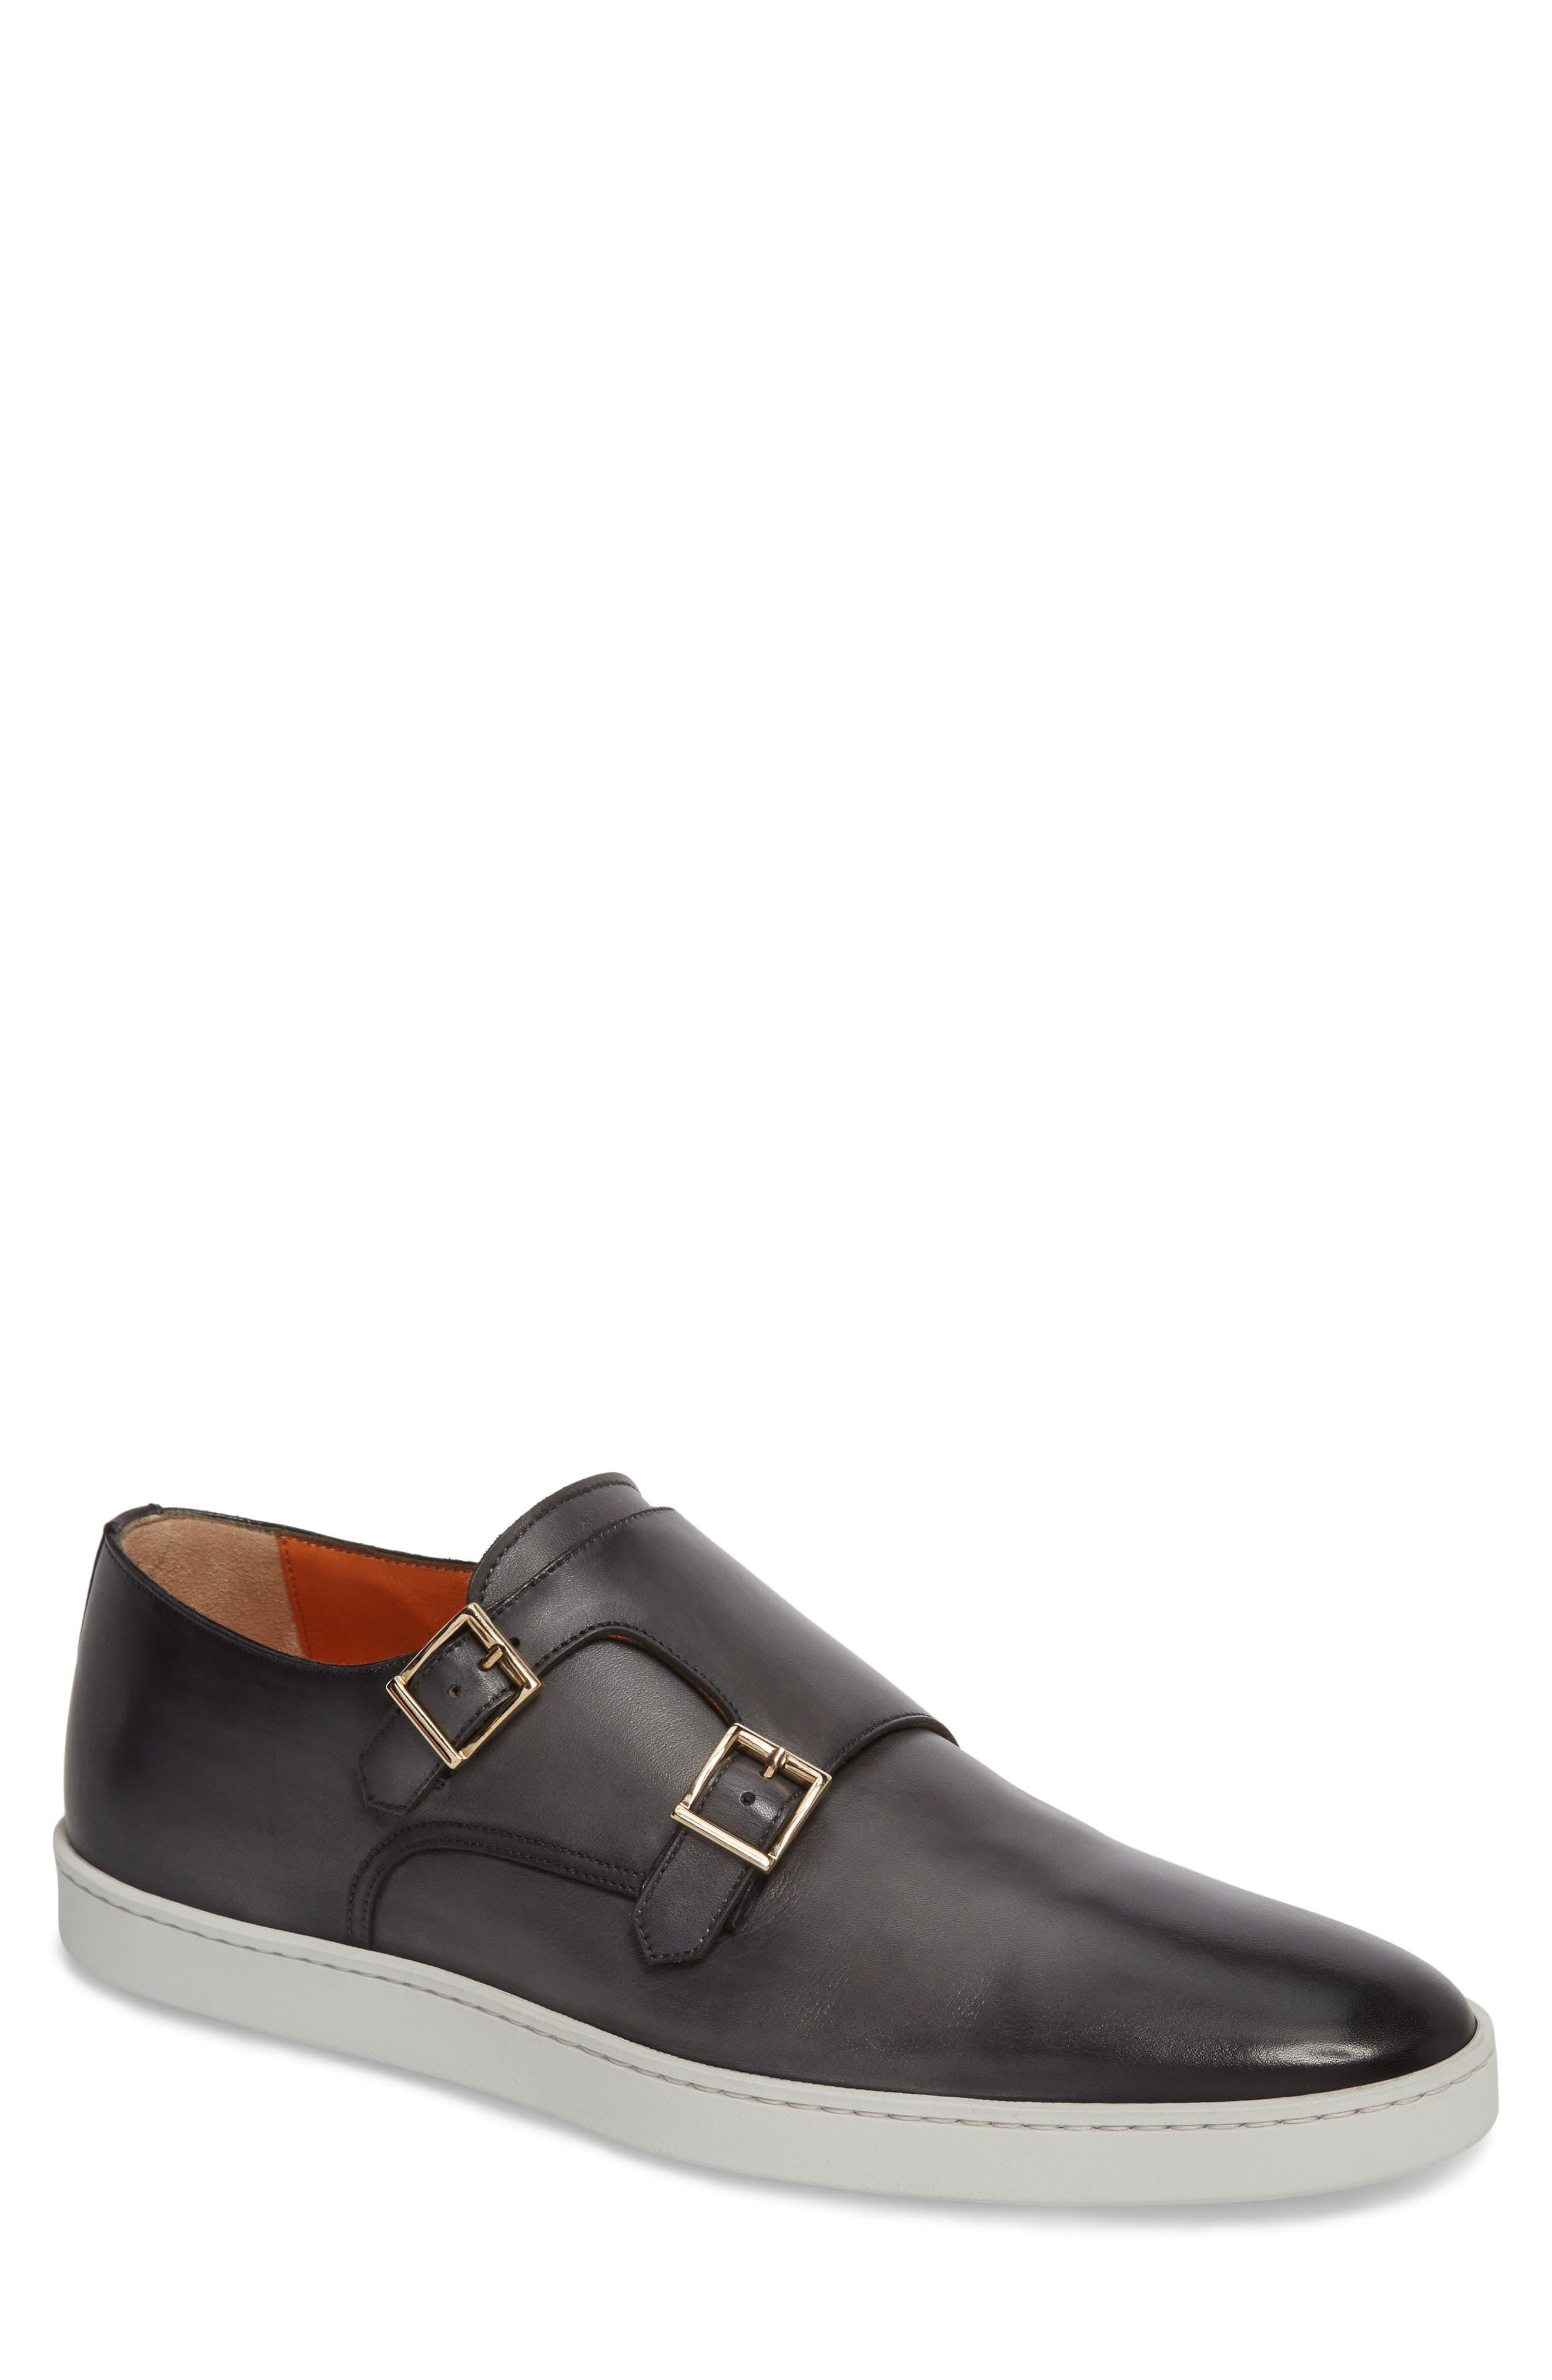 Freemont Double Monk Strap Shoe,                         Main,                         color, GREY